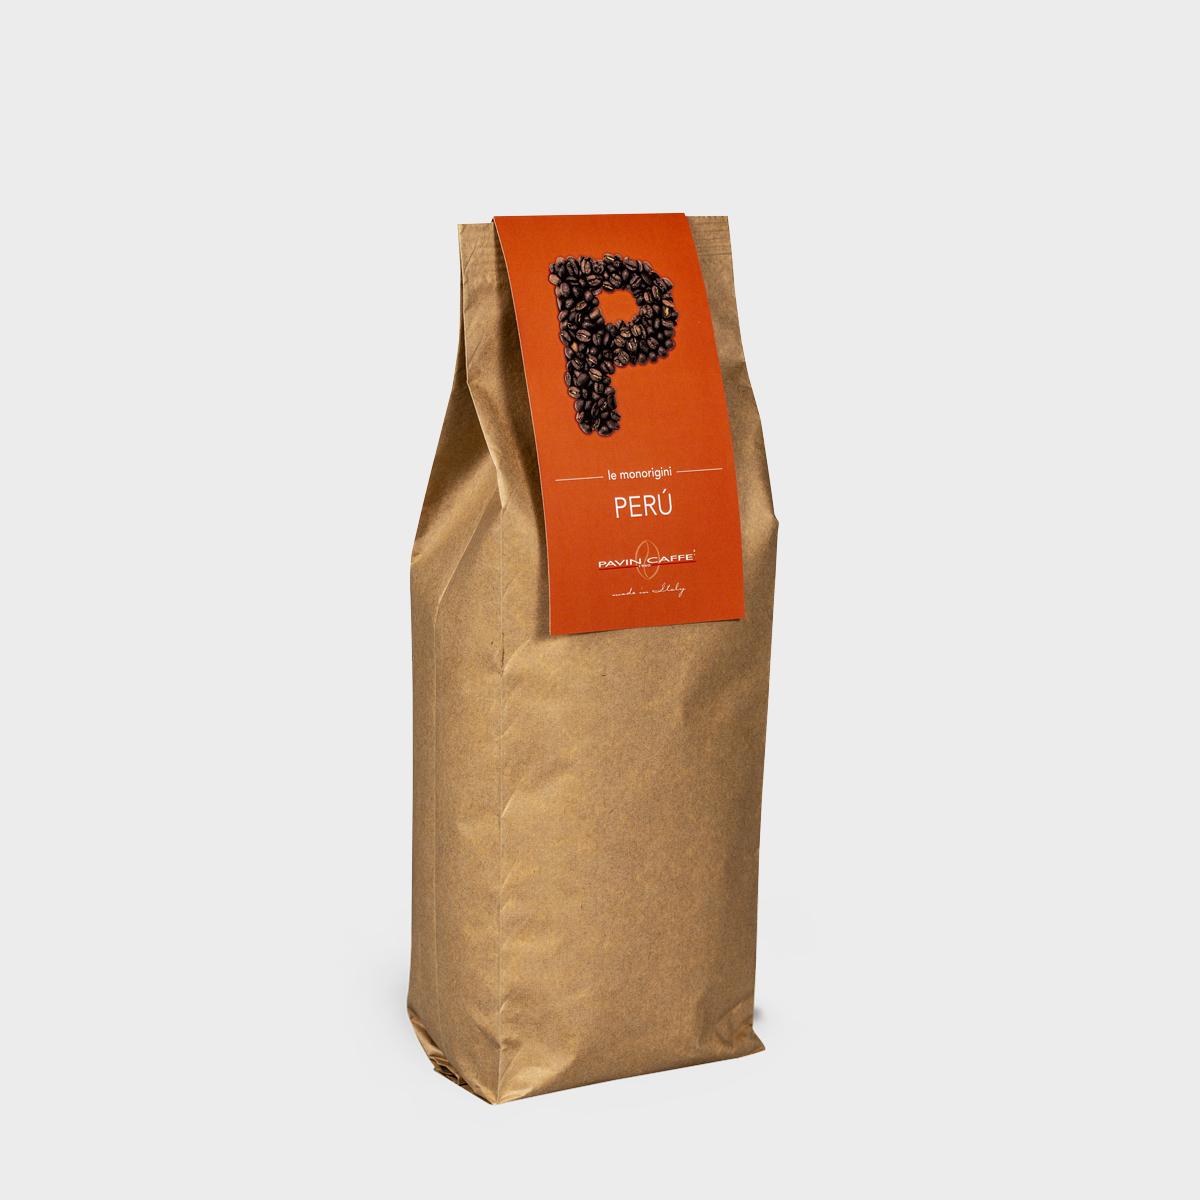 monorigine-pavin-caffe-peru